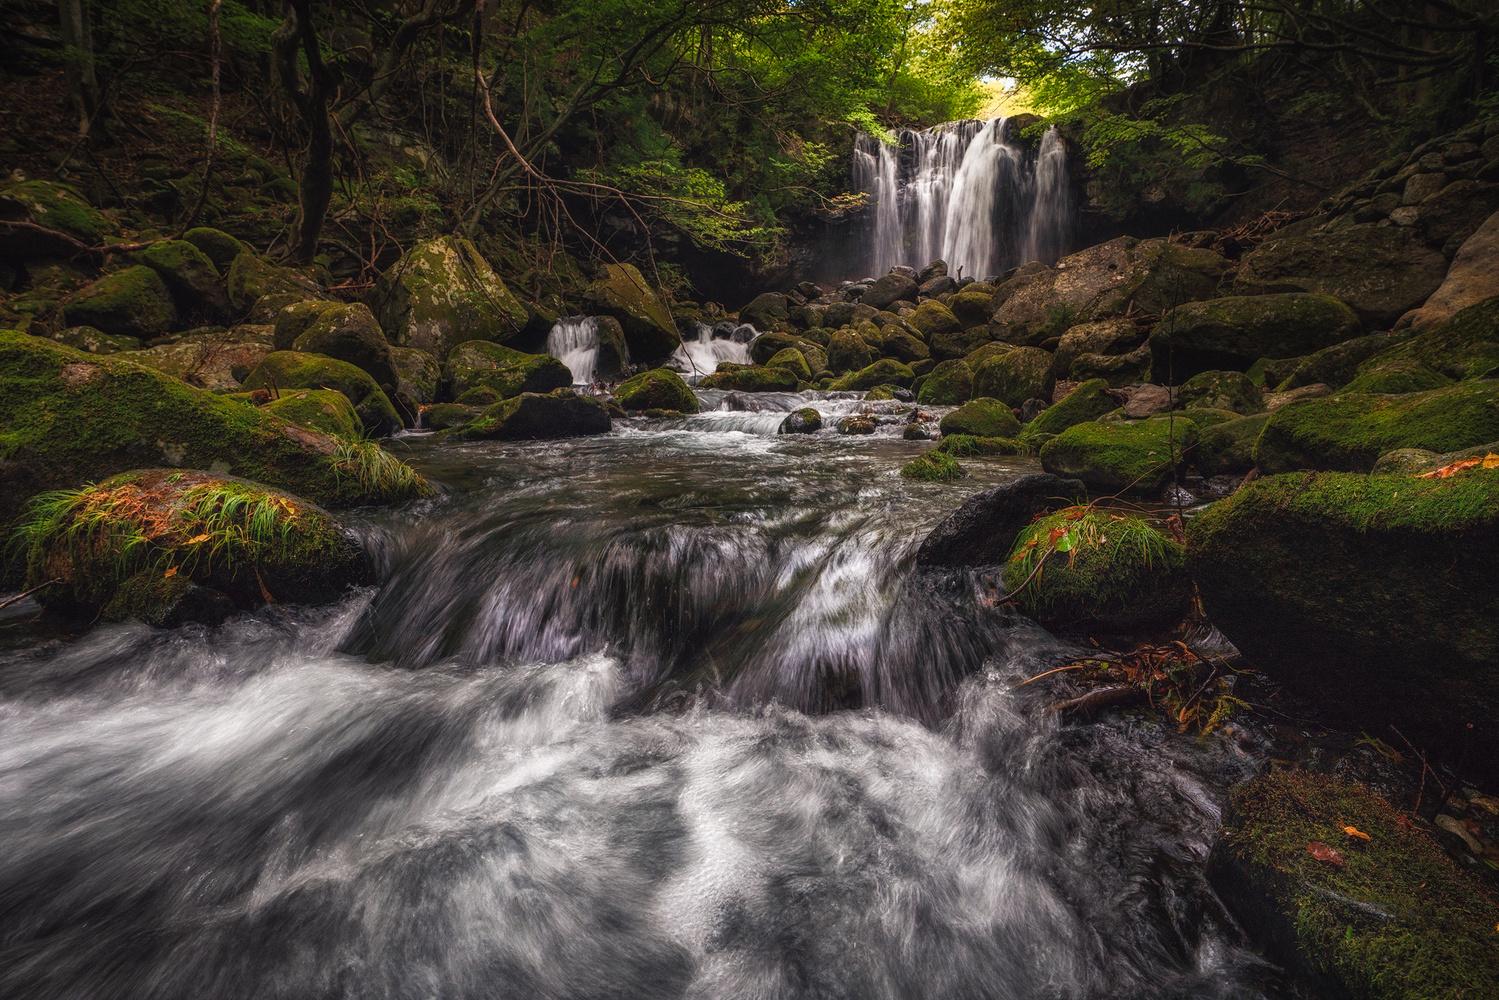 Otome waterfall by Shumon Saito